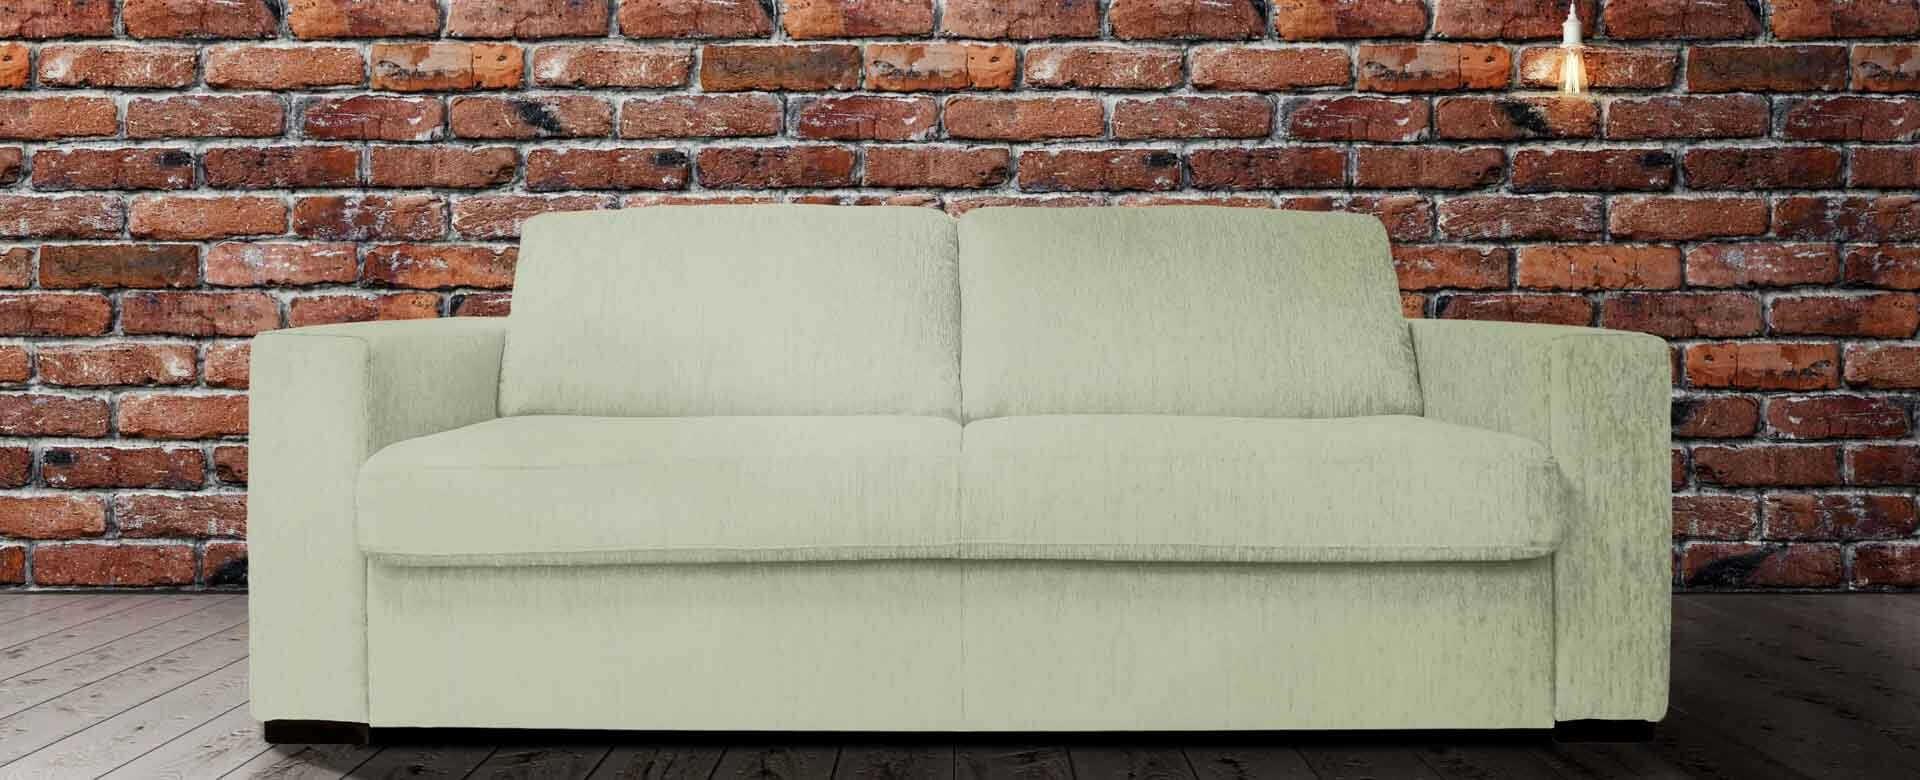 sofa bed trojsed